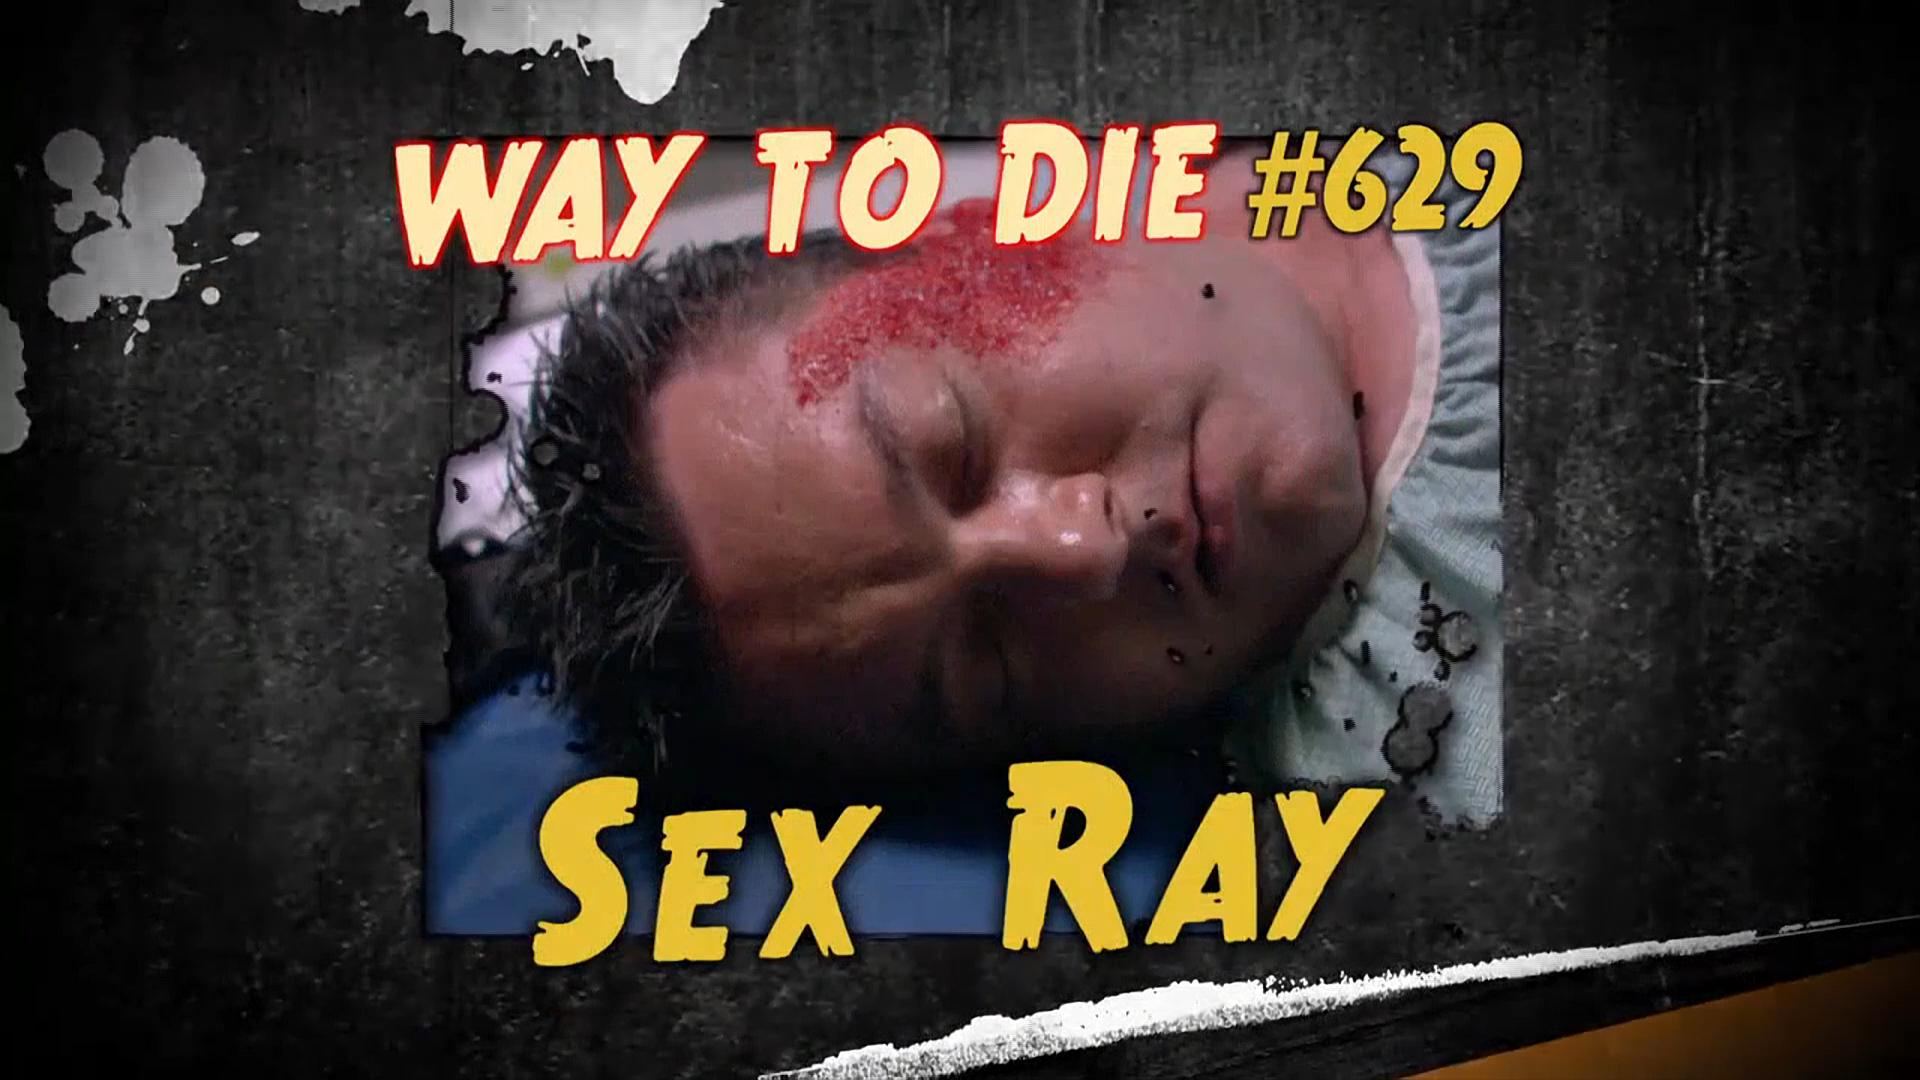 Jackson mississippi sex x ray death